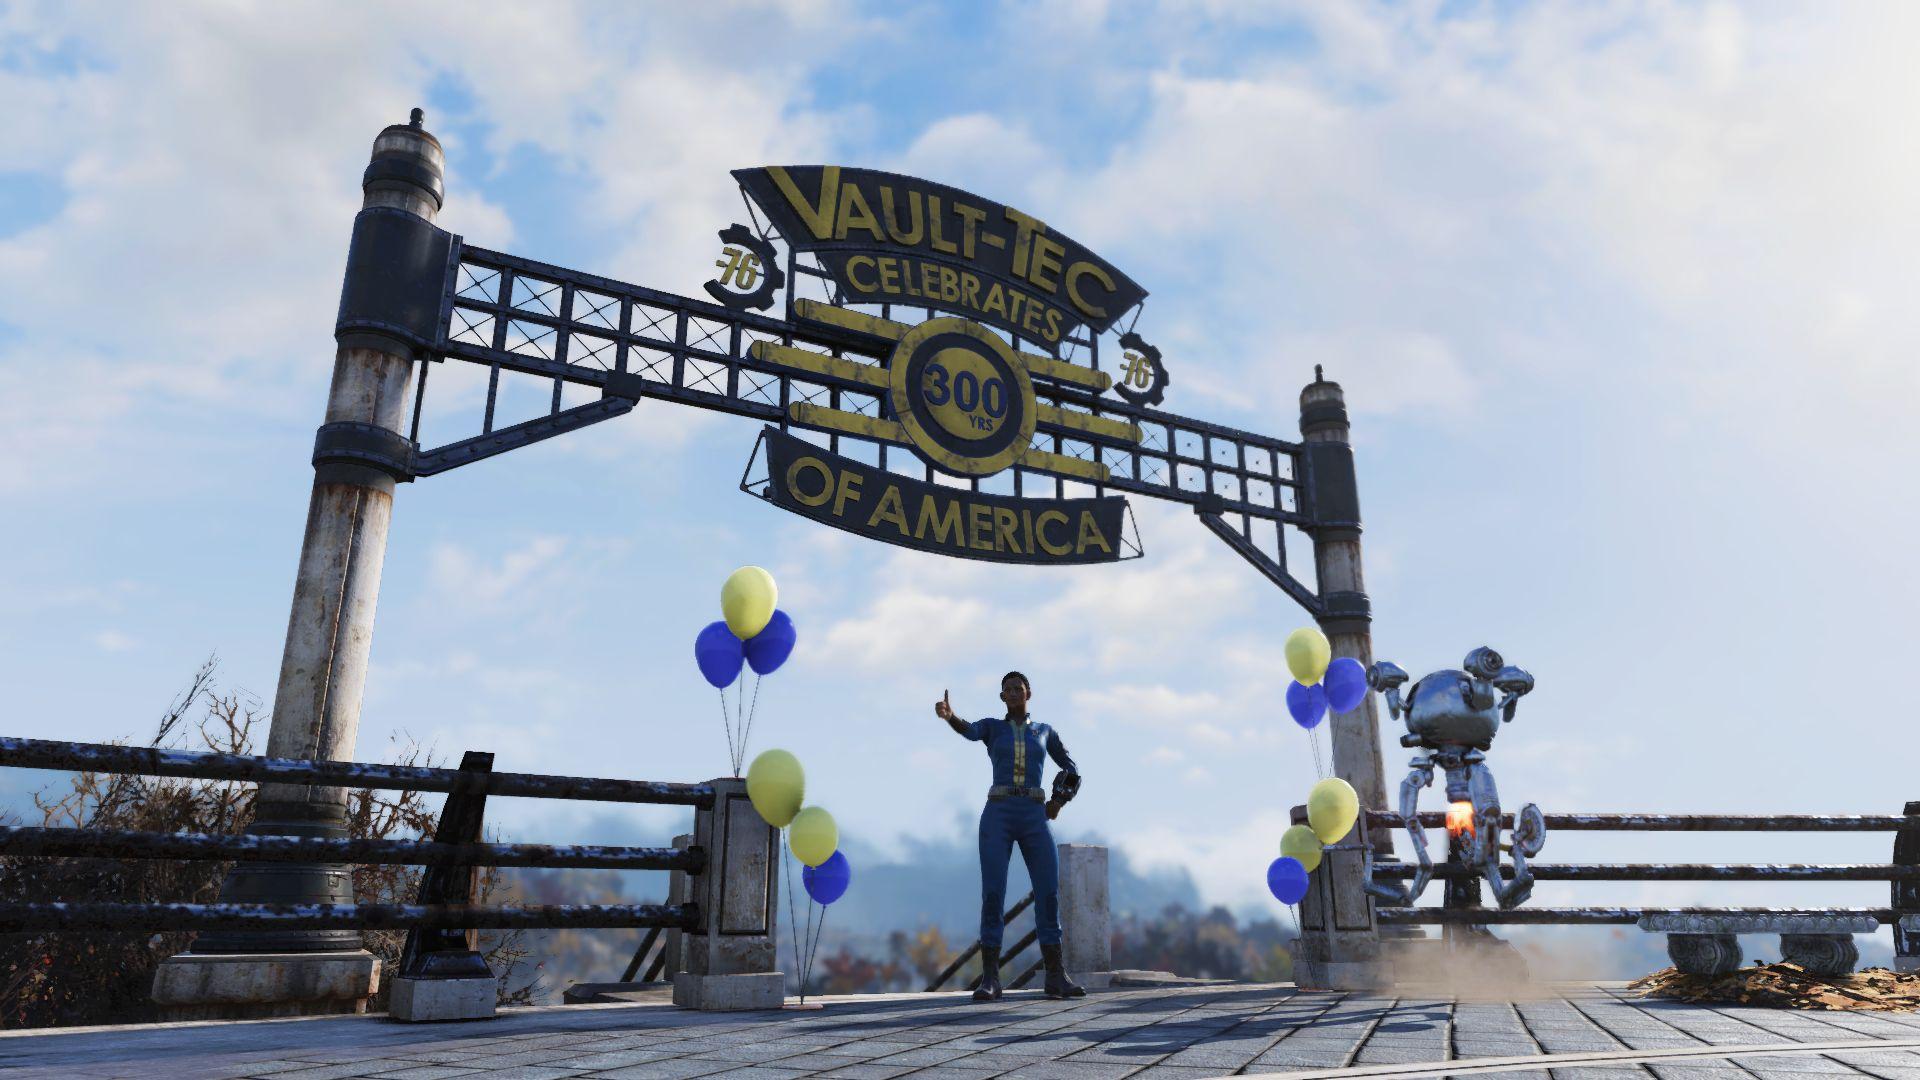 Seorang pemain dengan jumpsuit biru dan kuning Vault-Tec berdiri mengacungkan jempol di bawah tanda besar bertuliskan'Valt-Tec Merayakan 300 Tahun Amerika. Ada beberapa balon kuning dan biru di kedua sisinya.